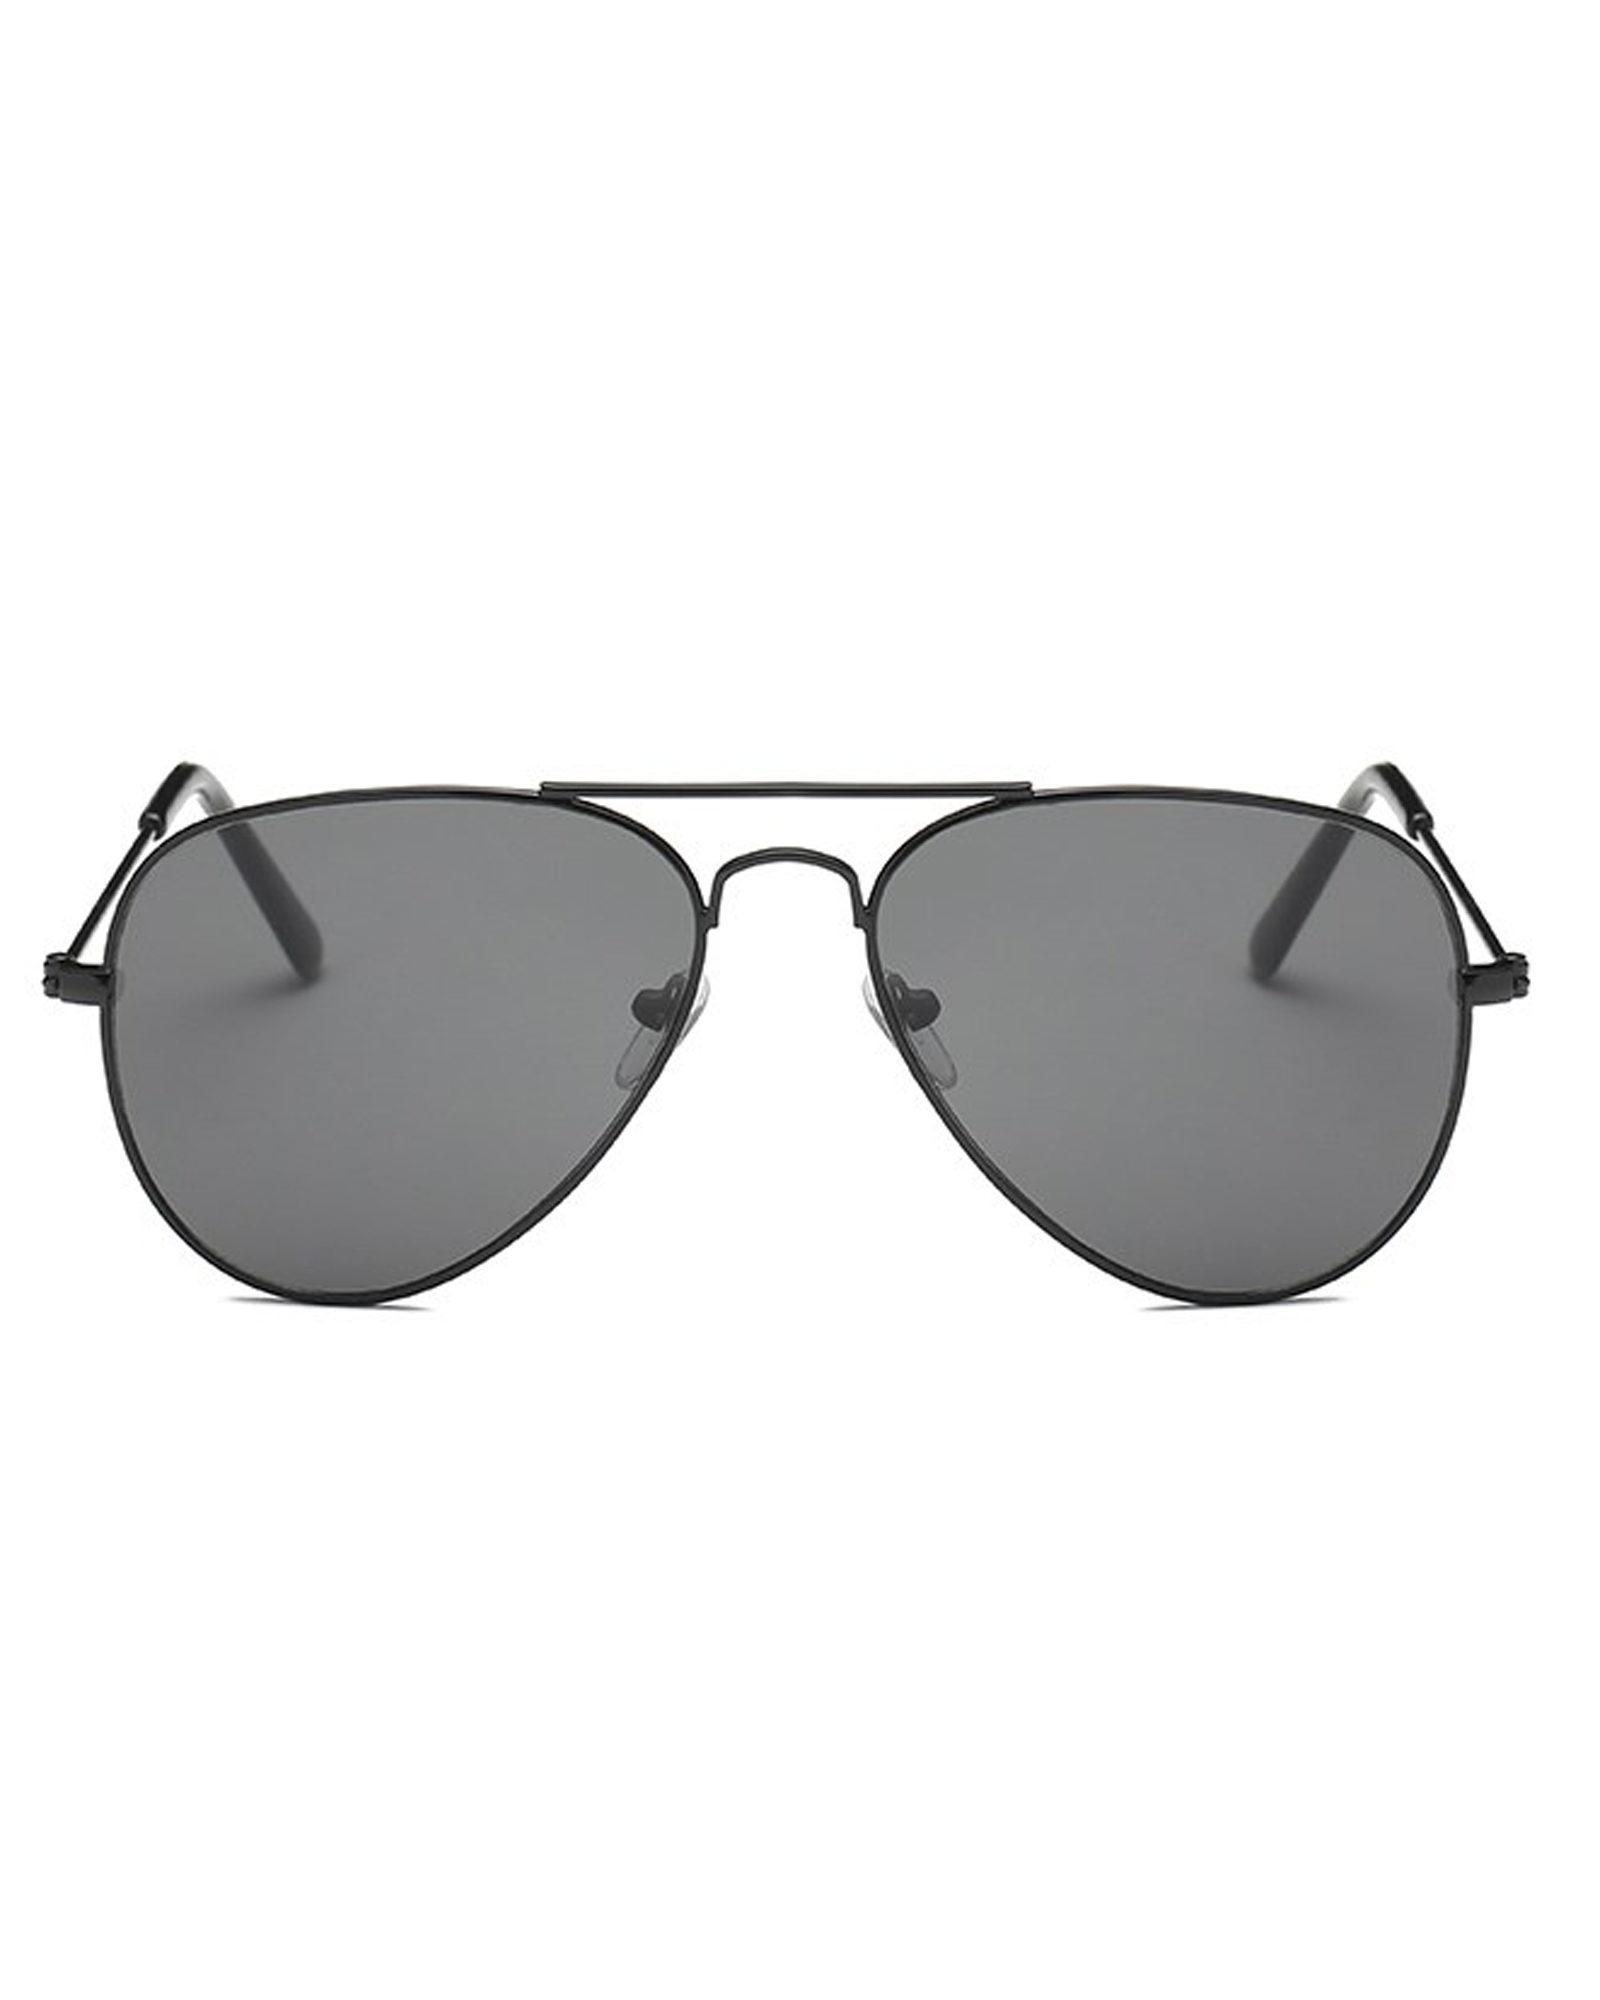 OOVY Aviator Kids Sunglasses Cool Kids